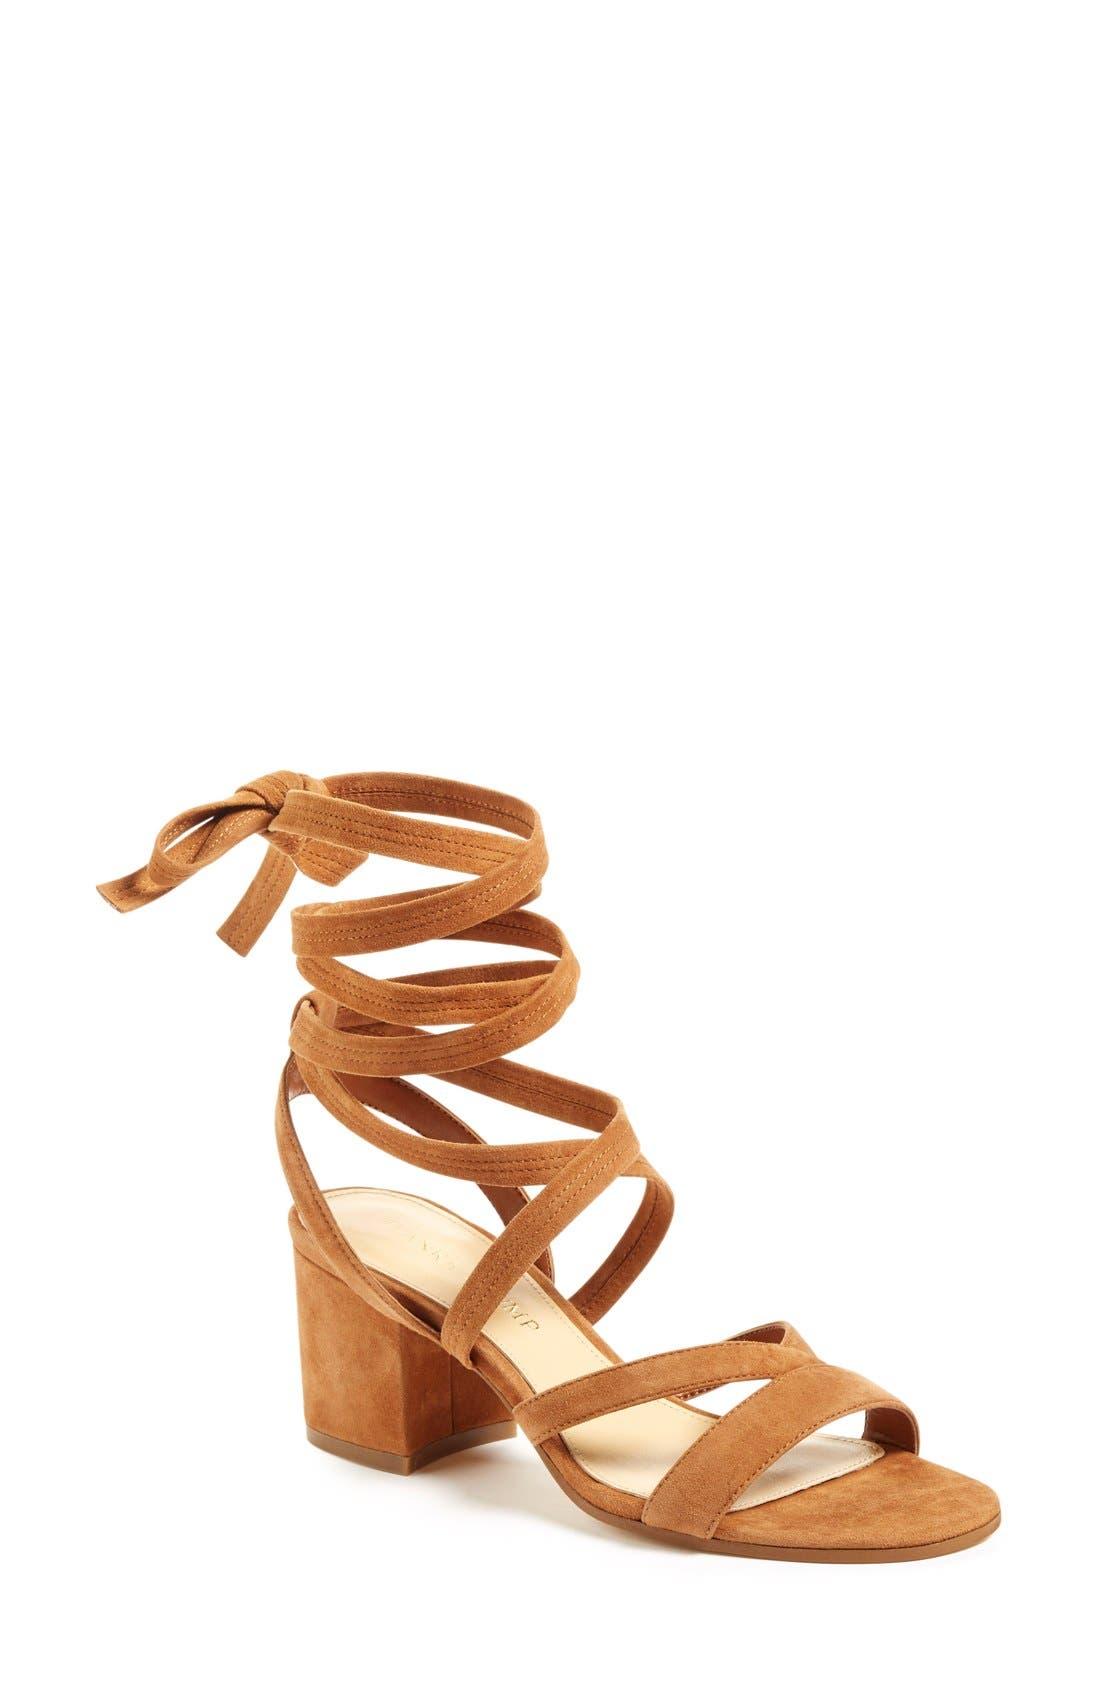 Main Image - Ivanka Trump 'Ellyn' Lace-Up Sandal (Women)